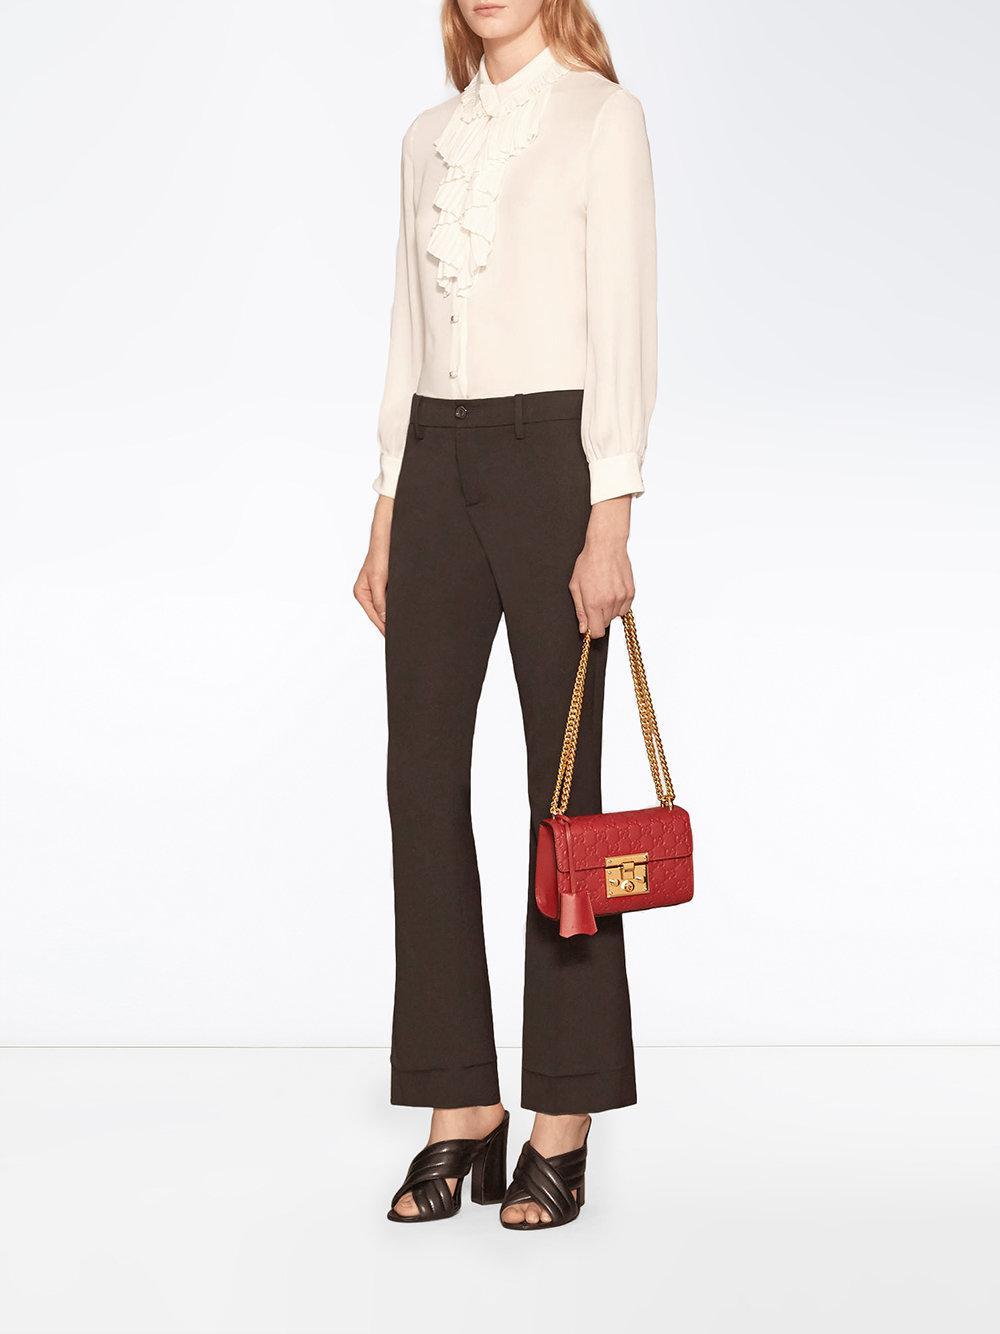 ab9083d7e132 Gucci - Red Small Padlock Signature Leather Shoulder Bag - Lyst. View  fullscreen